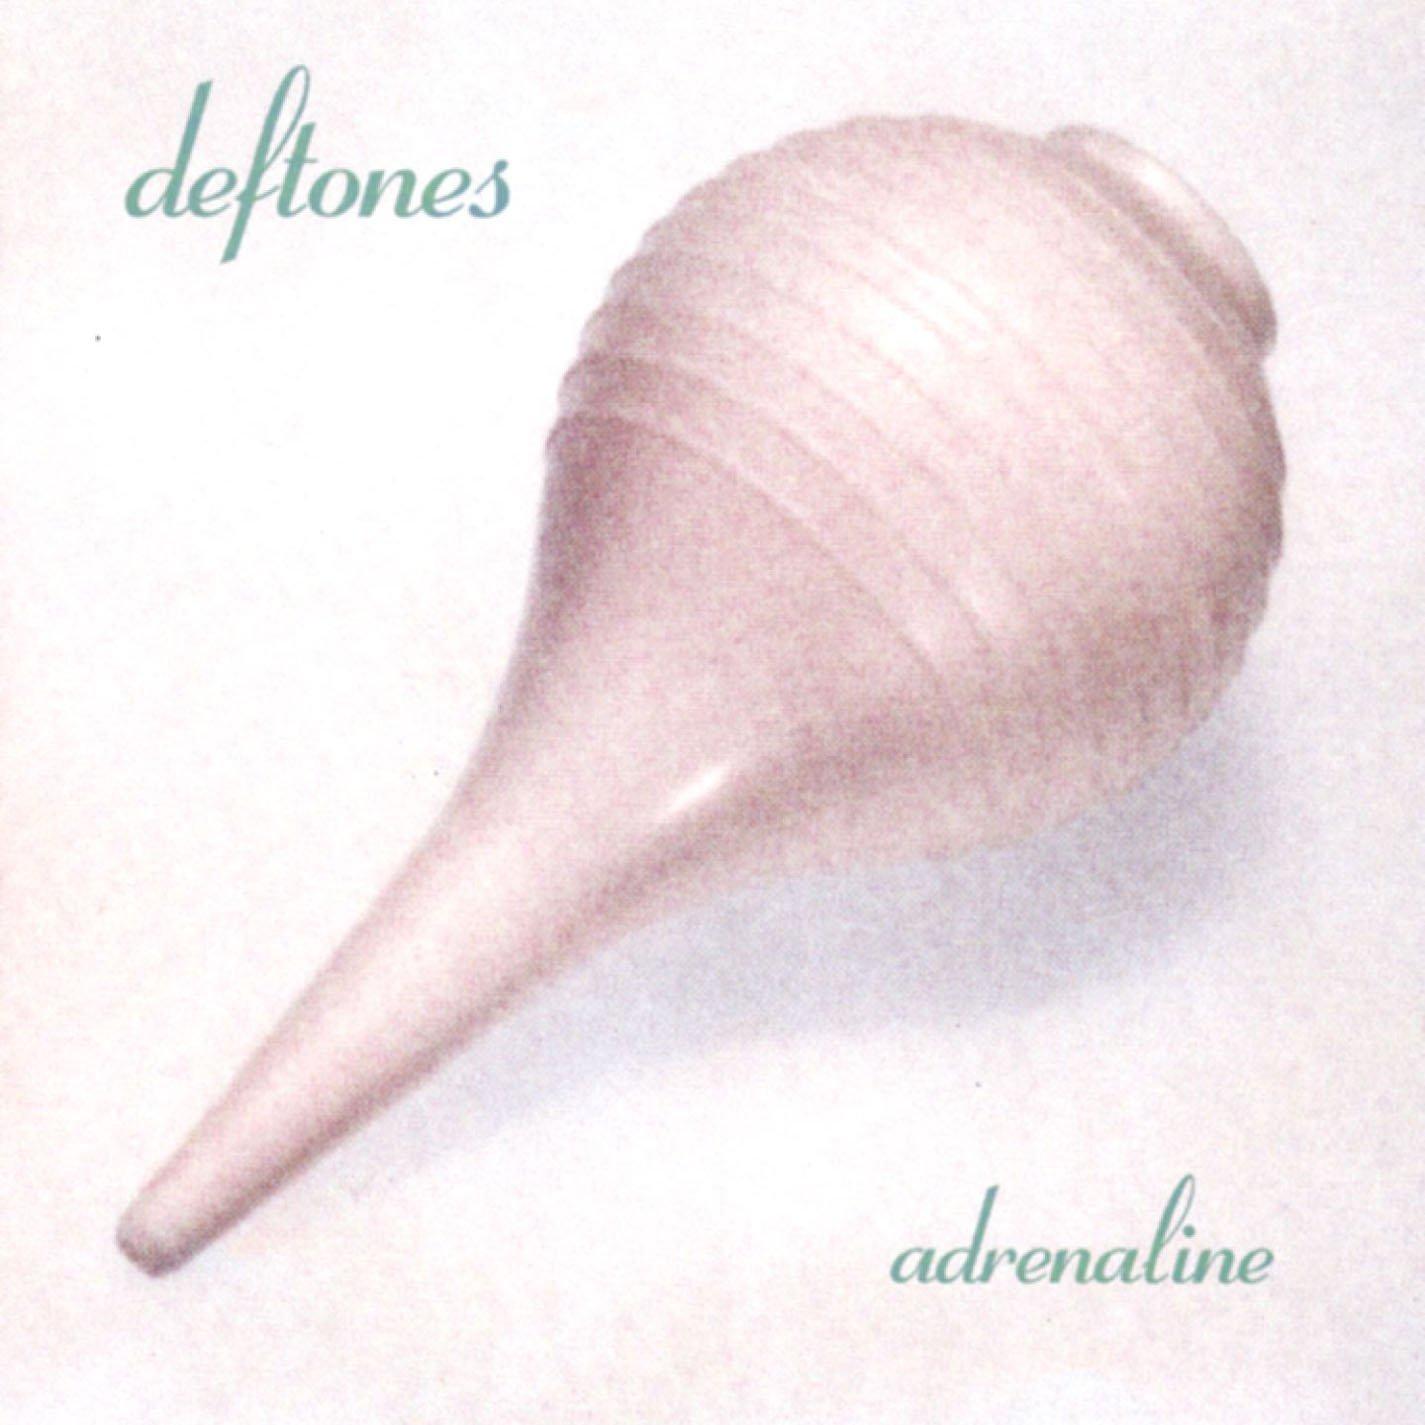 Deftones - Adrenaline Vinyl by Deftones image